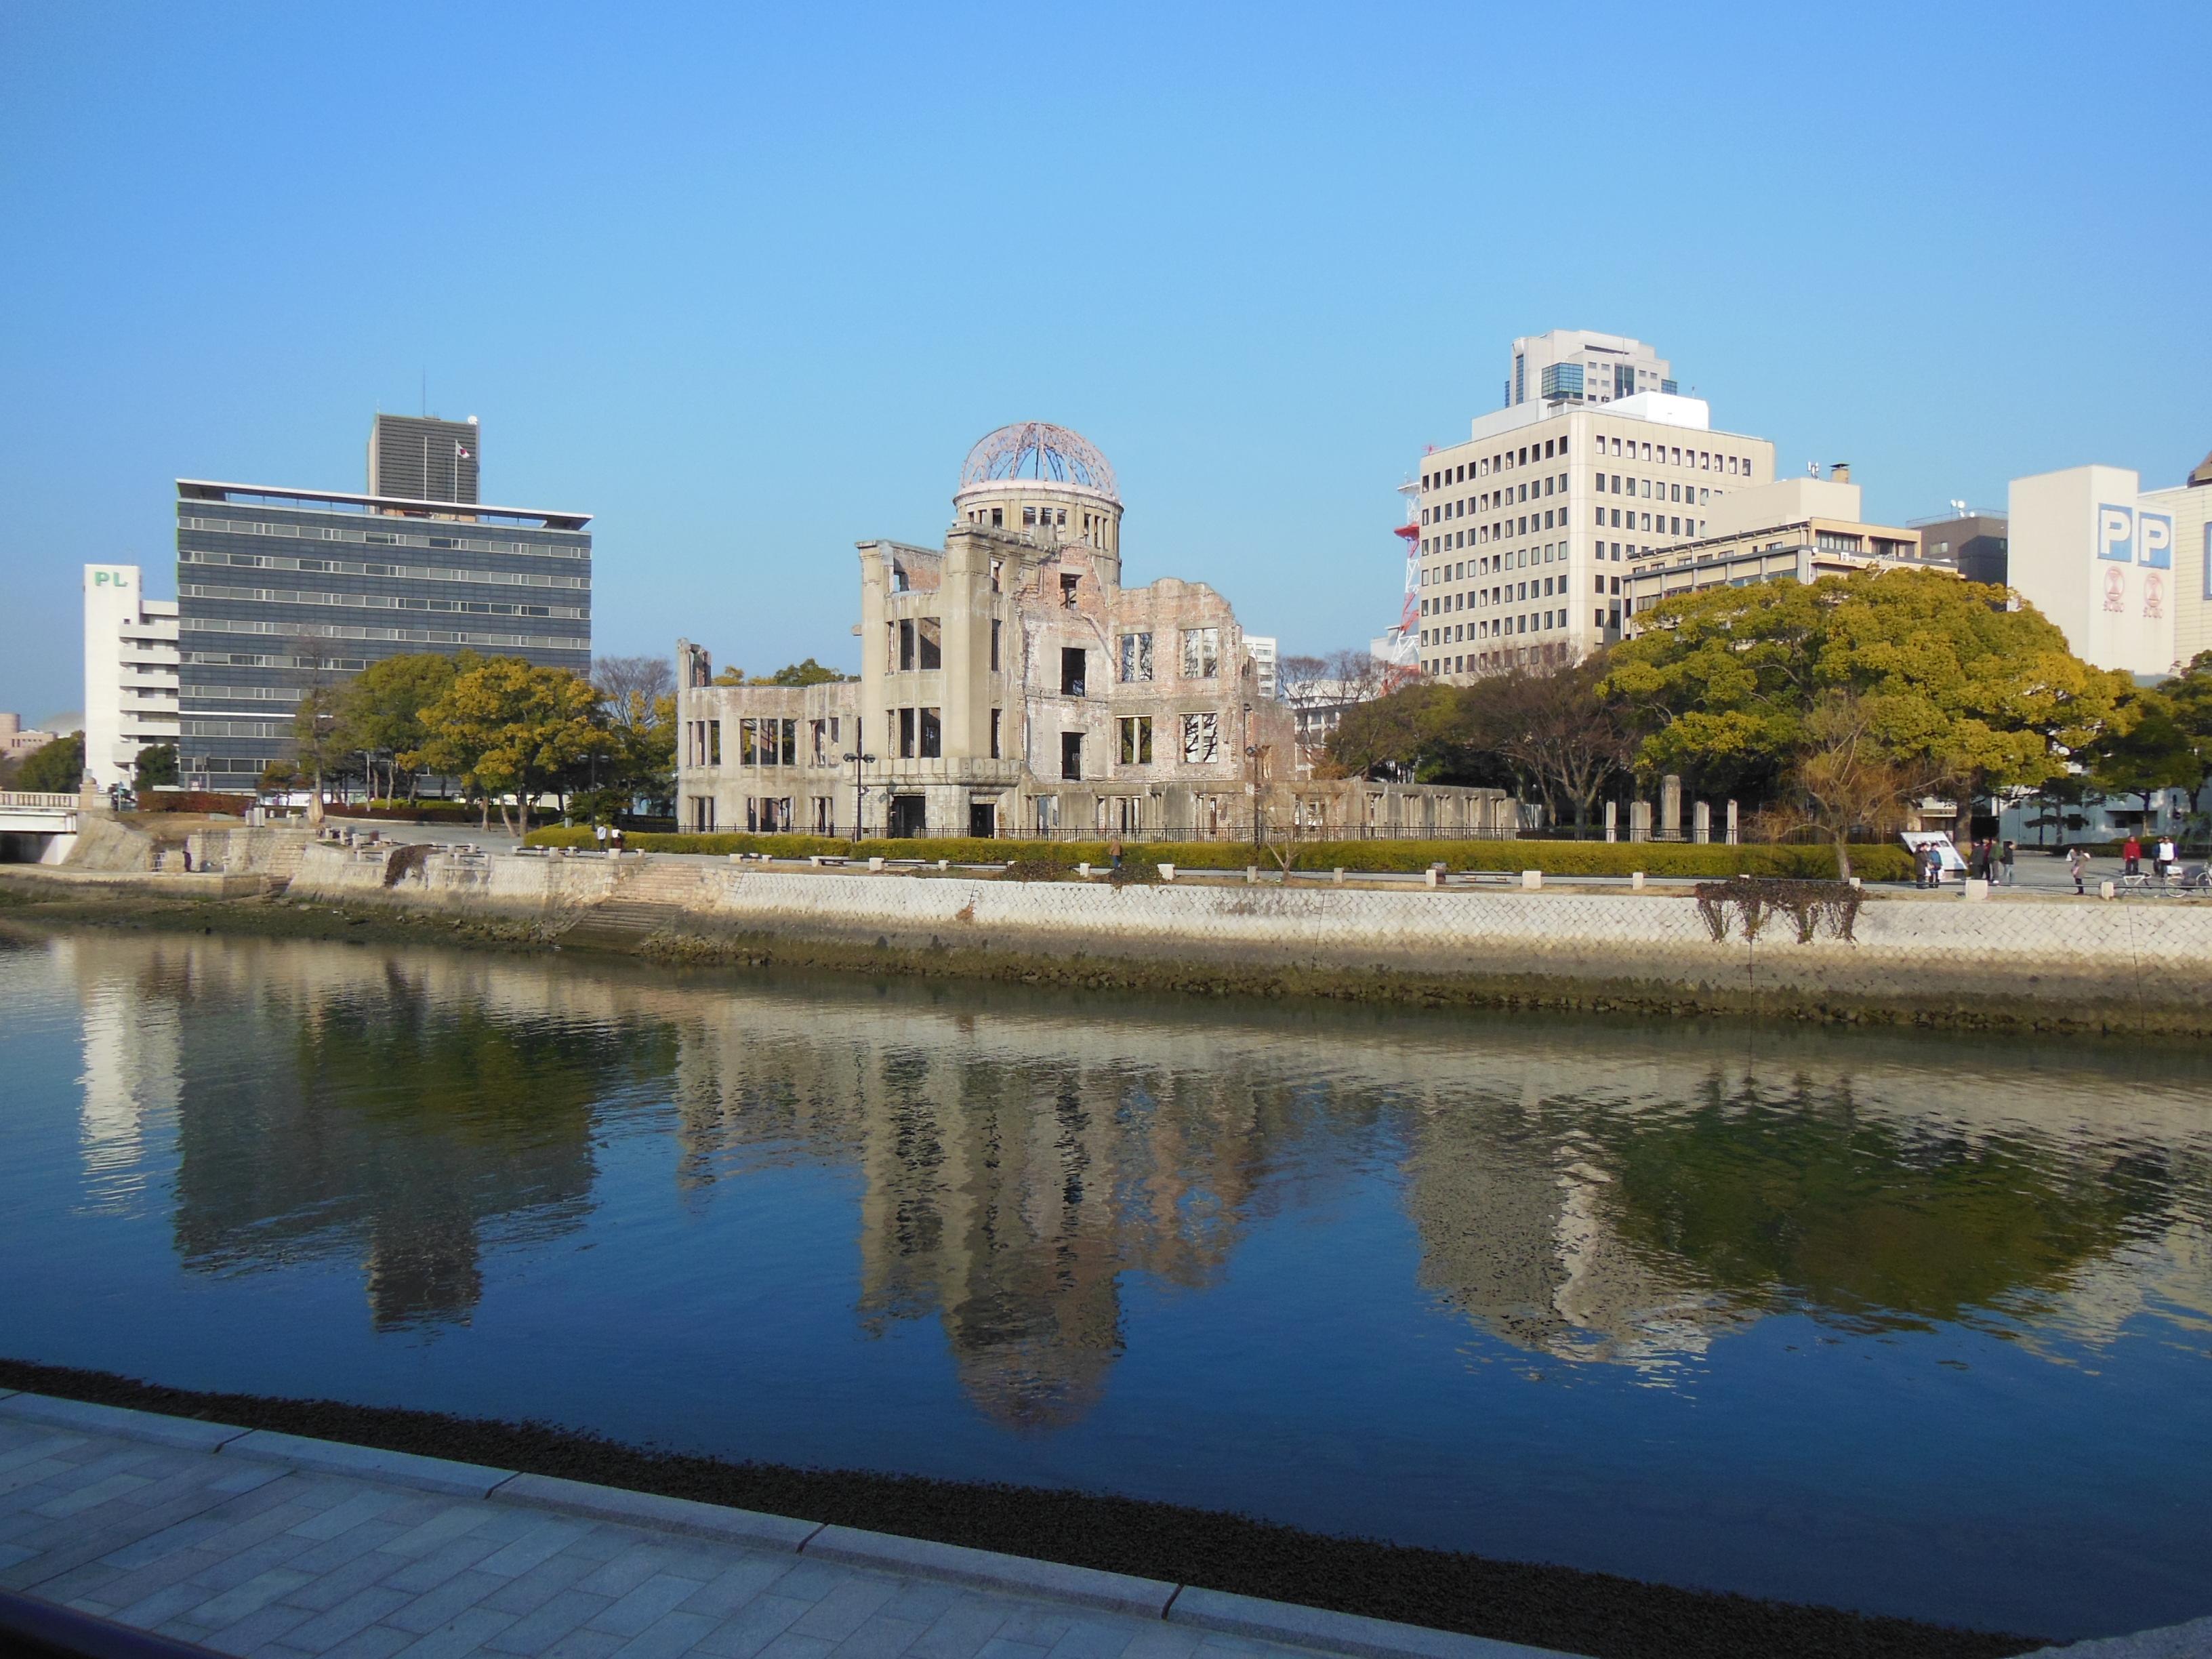 A-bomb dome, Hiroshima, Denkmal, Japan, Weltkulturerbe, UNESCO, Atombombenanschlag, Atombombe